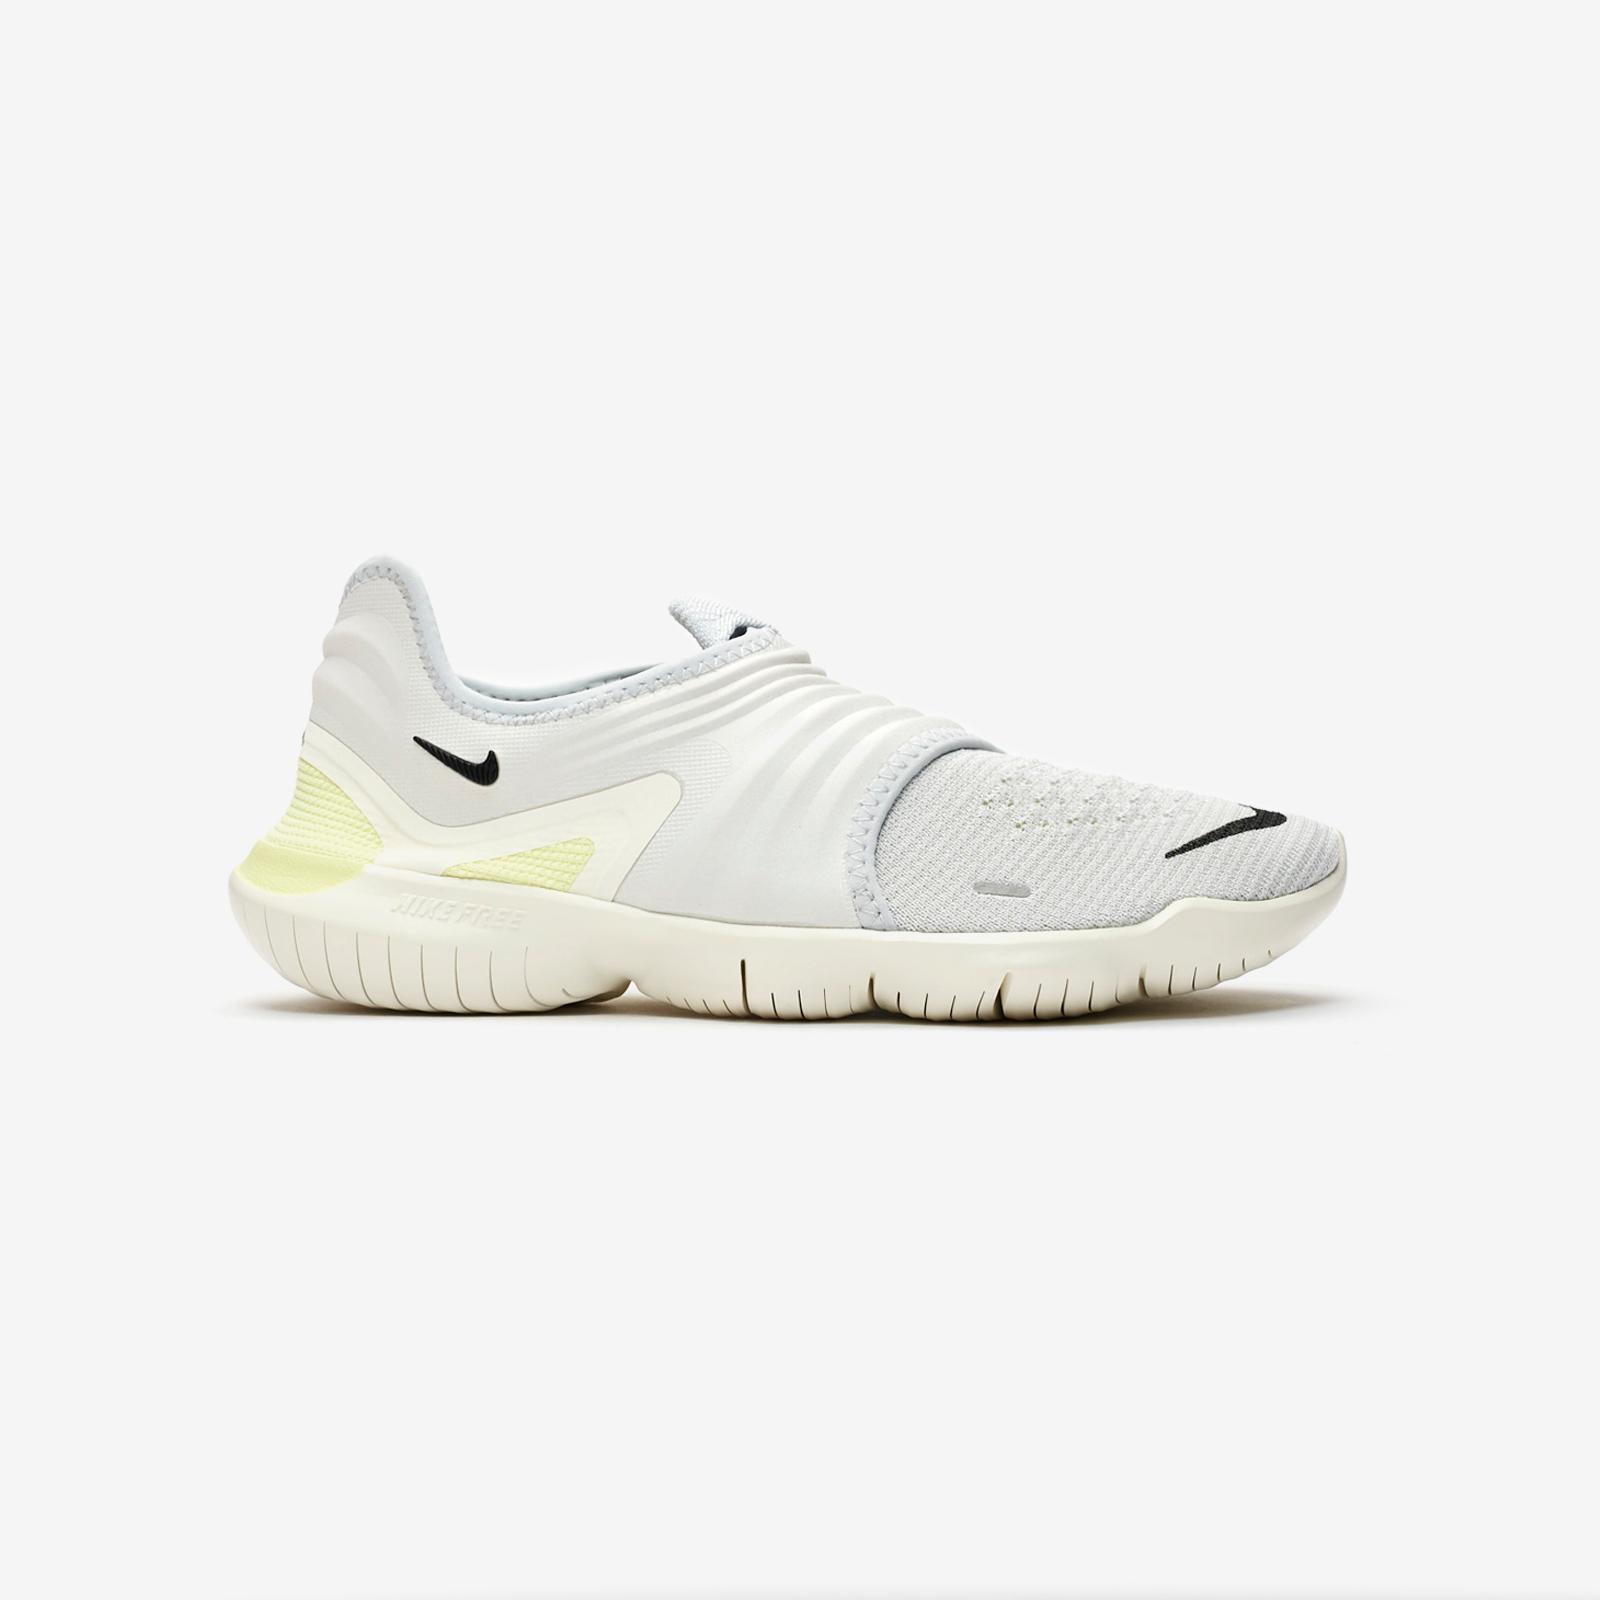 ae4ffdbe92bf Nike Free RN Flyknit 3.0 - Aq5707-004 - Sneakersnstuff